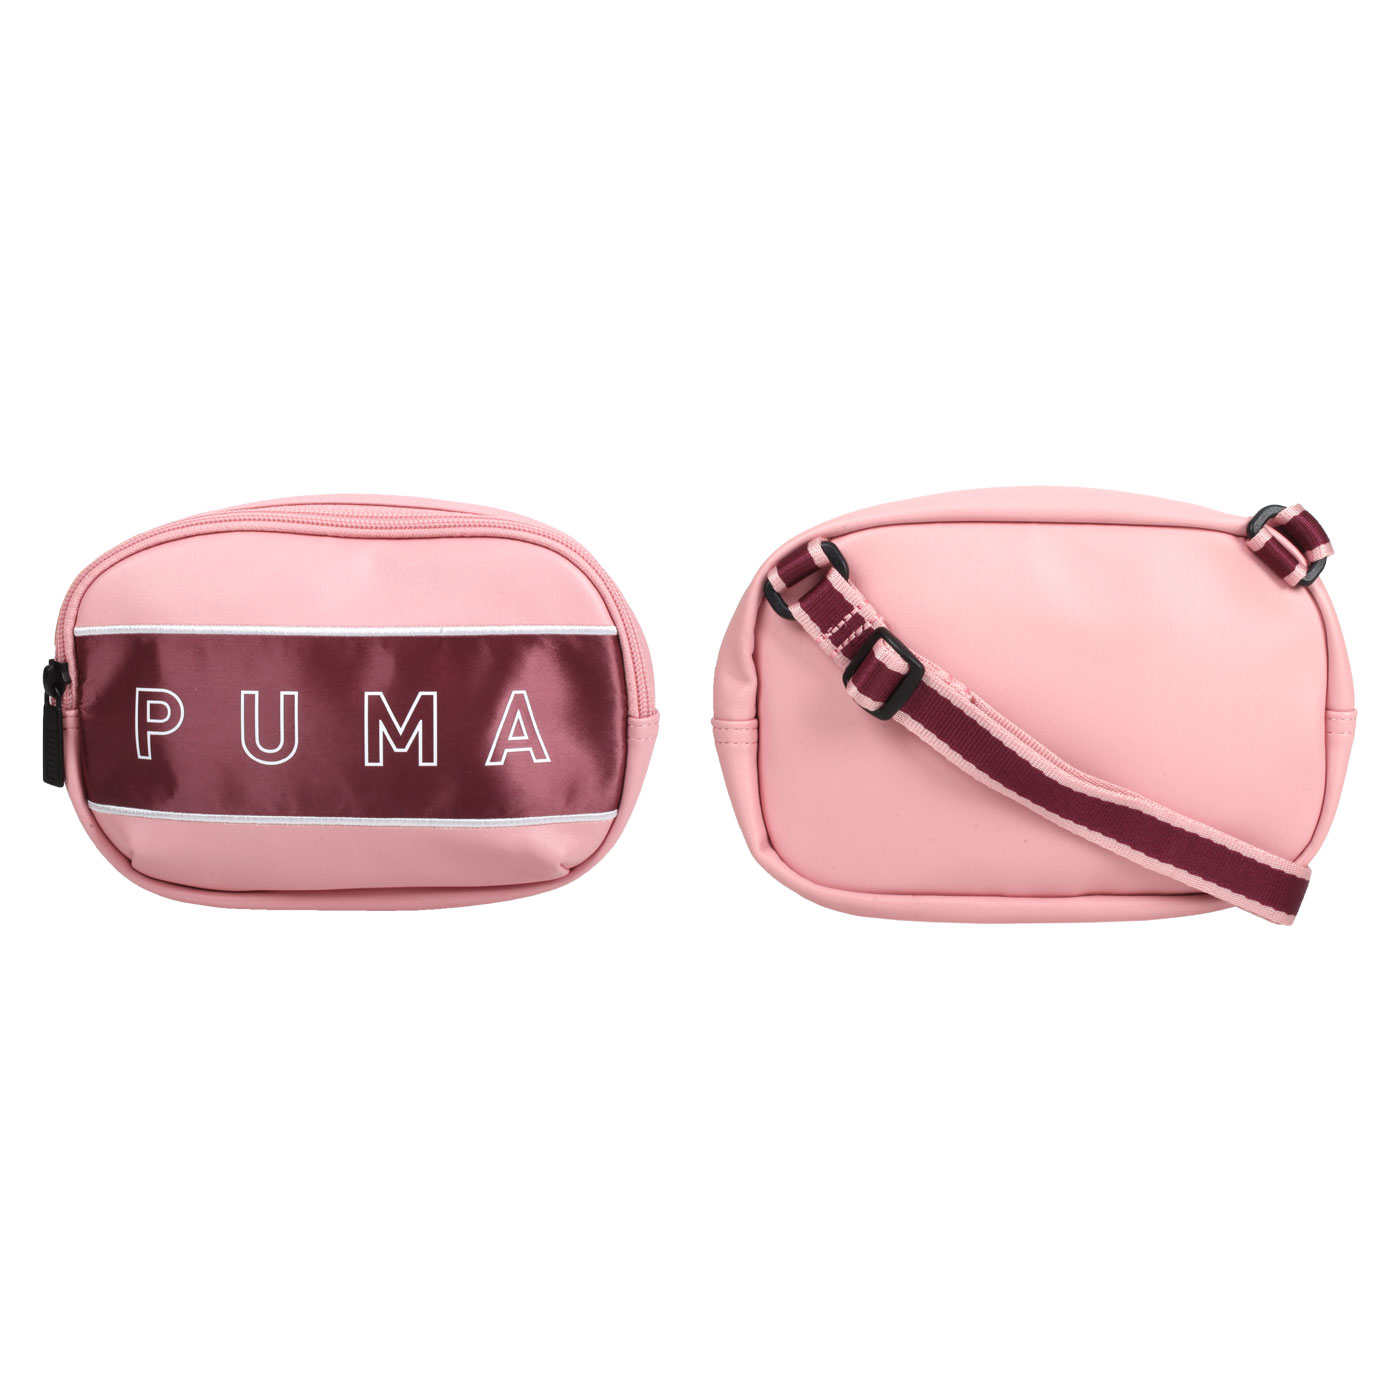 PUMA 側背小包 07739103 - 粉紅酒紅白